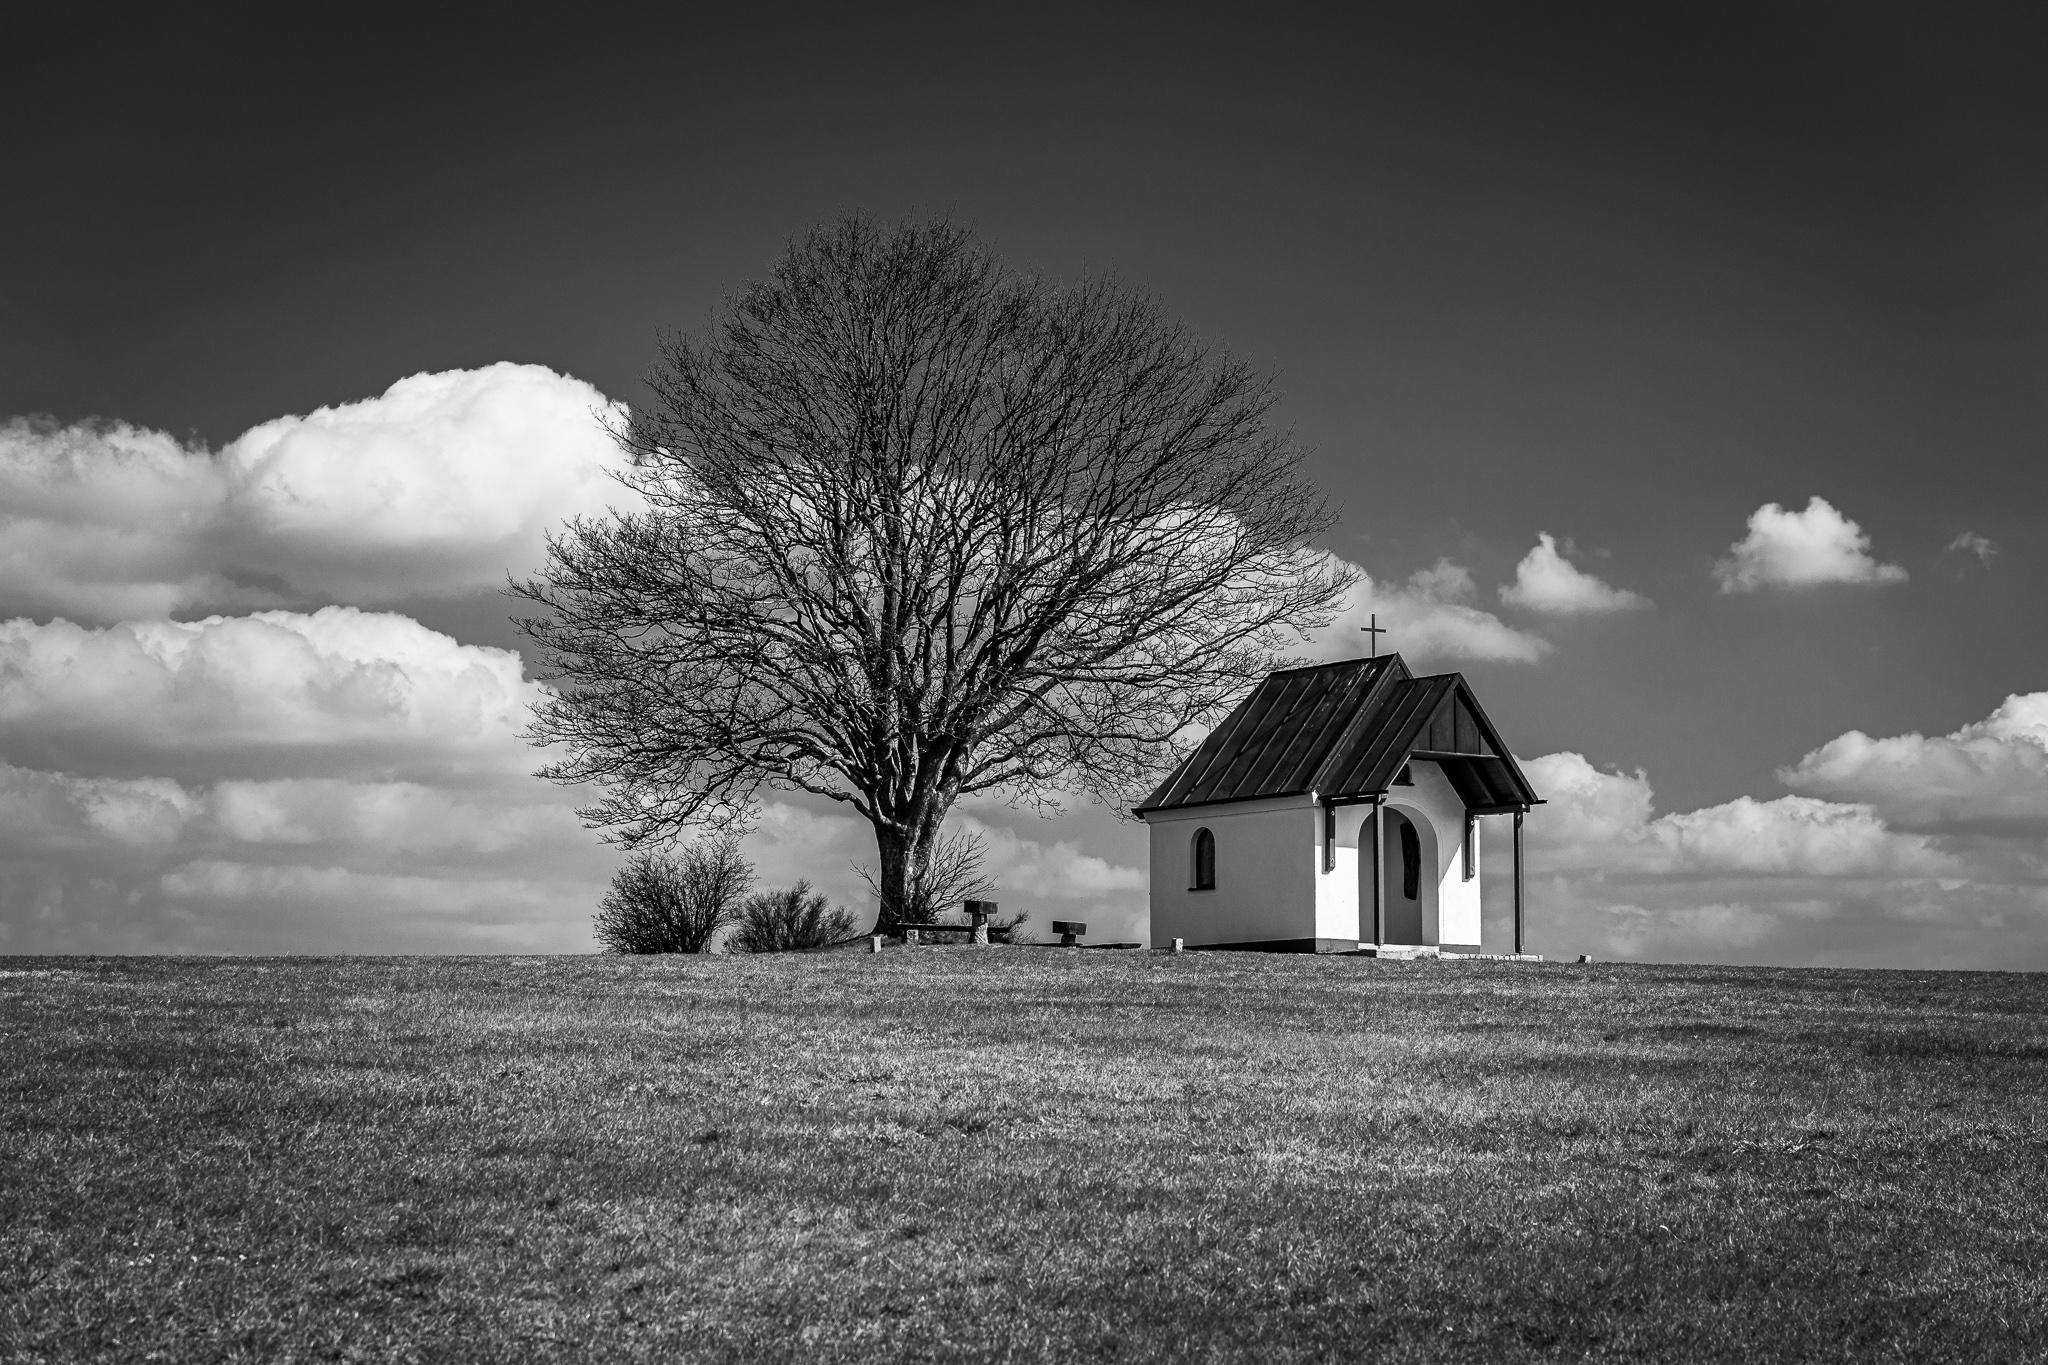 Chapel with Peach Tree, Germany